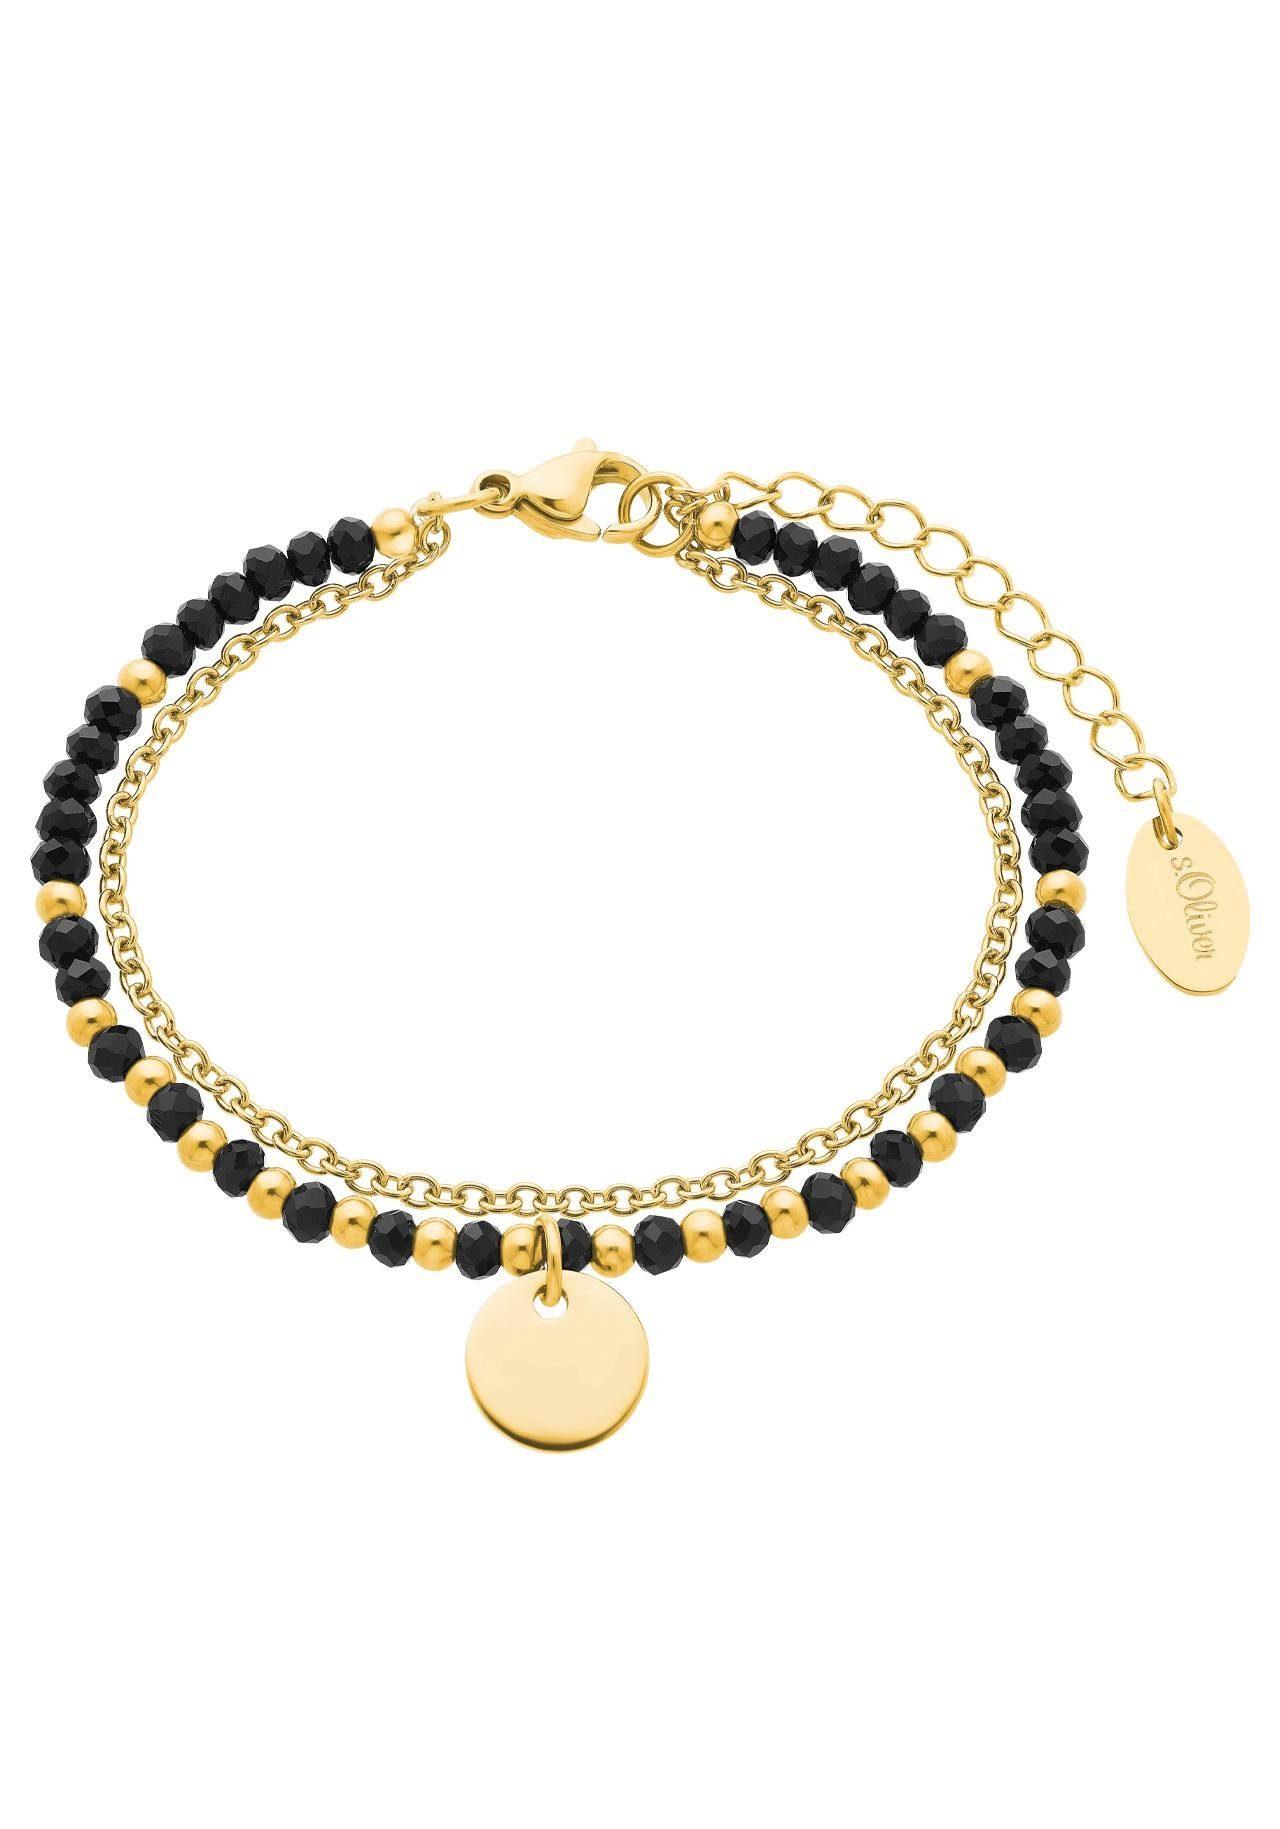 s.Oliver Armkette Bracelet Bar, 2026183 | Schmuck > Armbänder > Armketten | s.Oliver